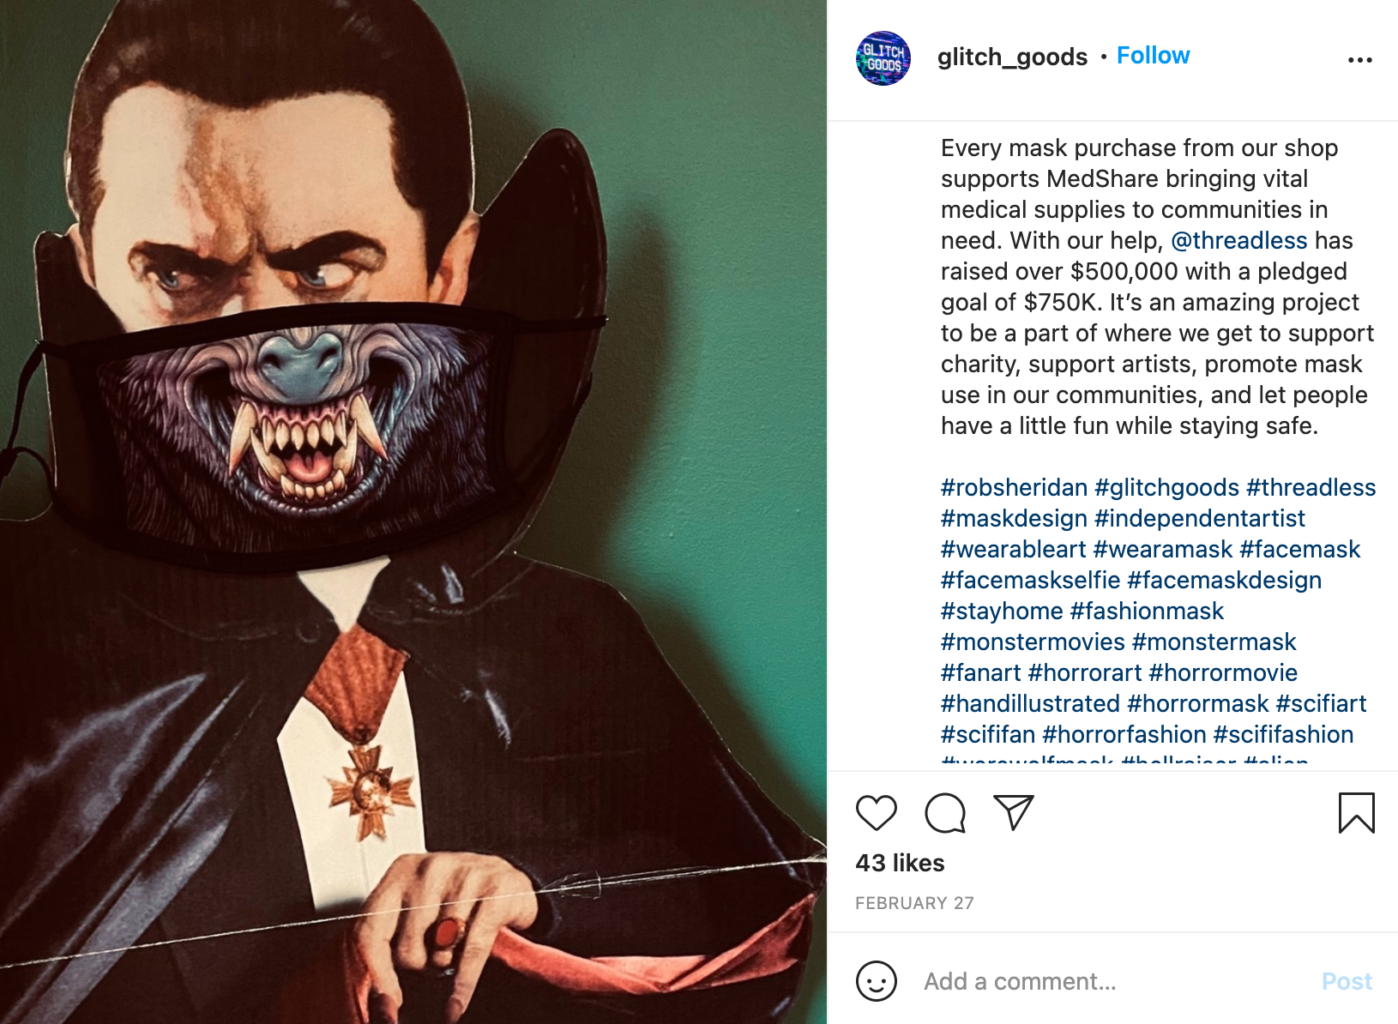 Glitch Goods by Rob Sheridan Instagram Post